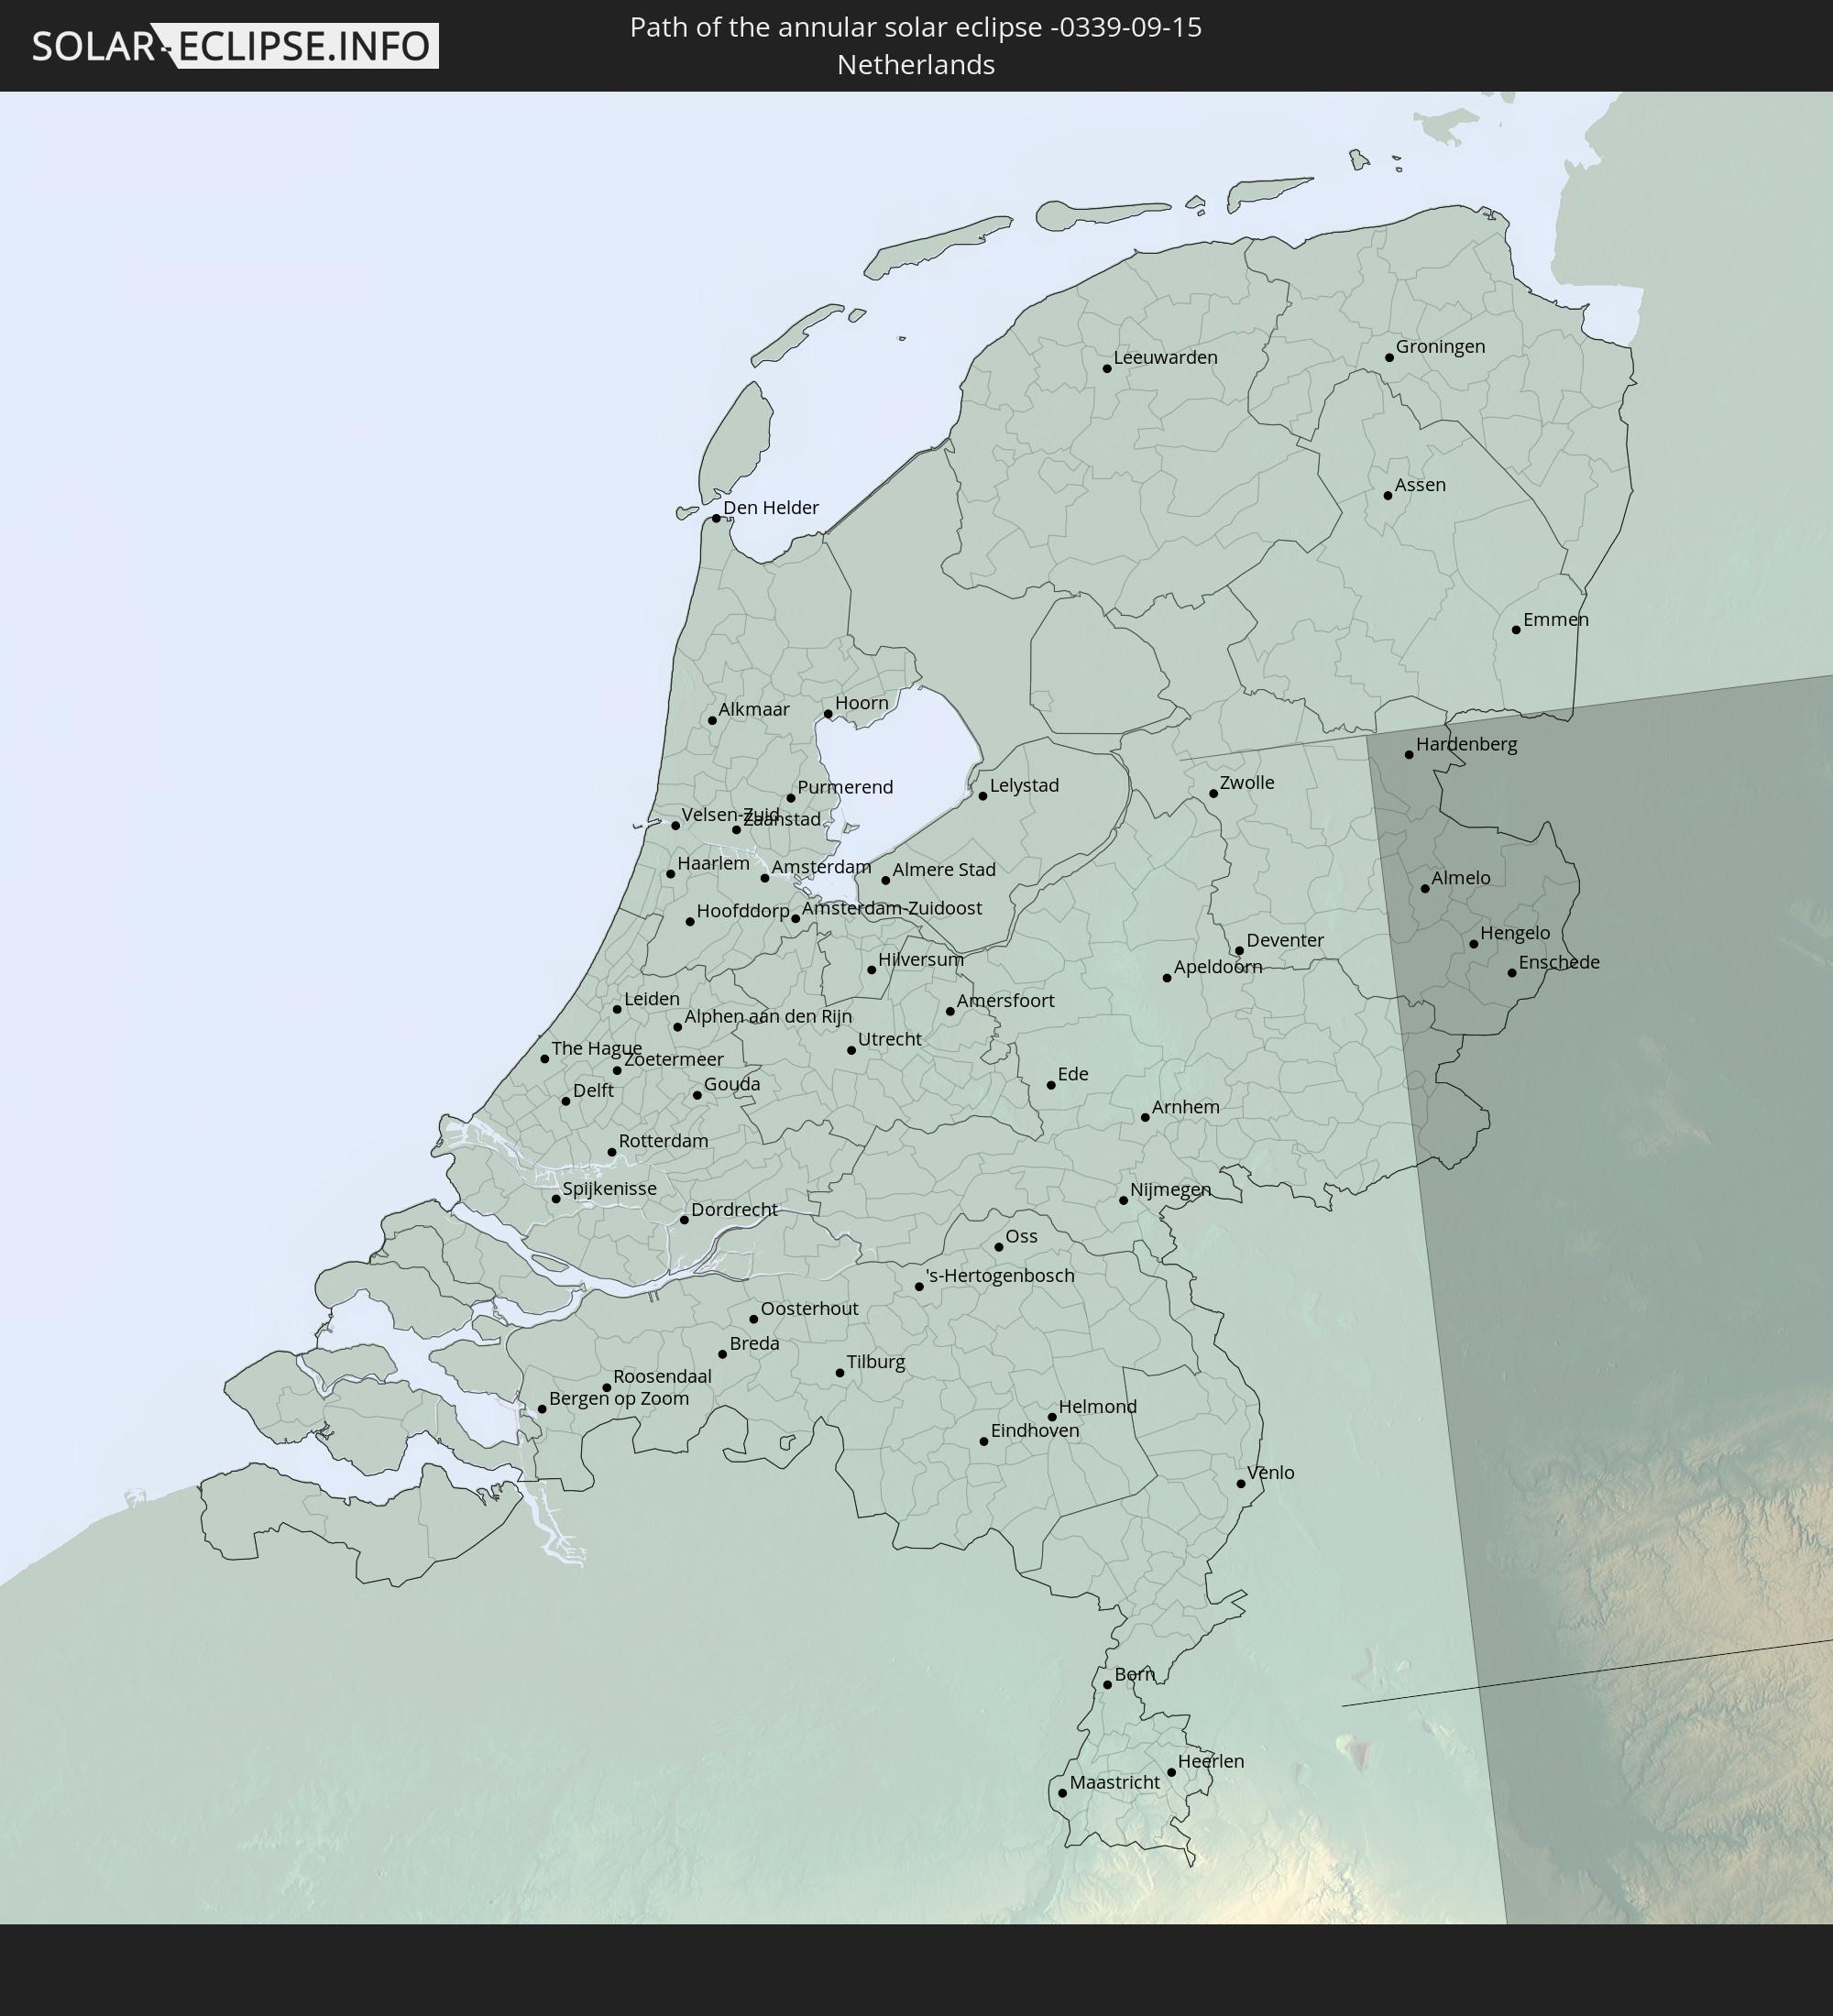 worldmap Netherlands The annular solar eclipse of